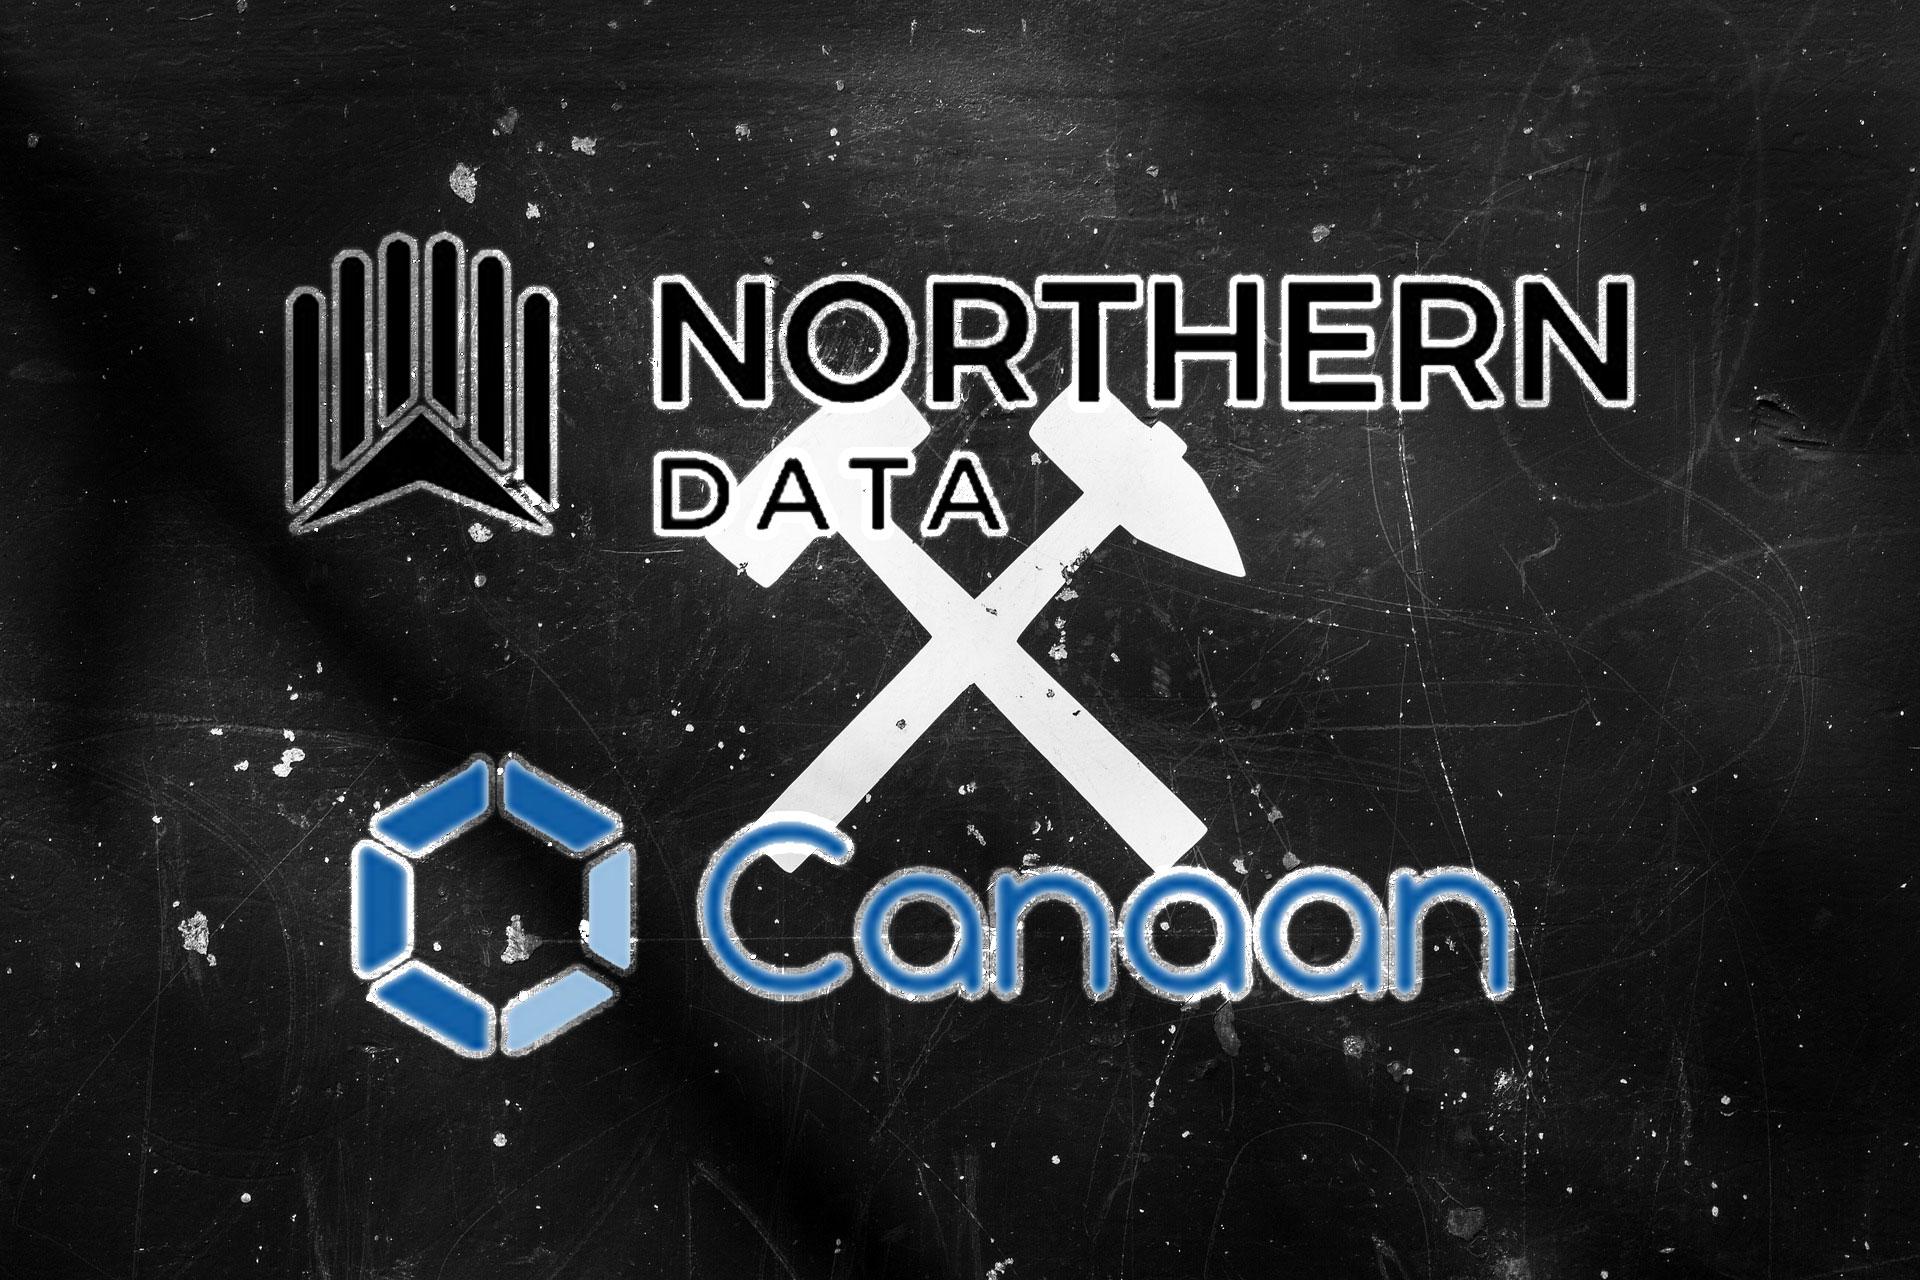 Northern Data AG社、仮想通貨マイニング大手のCanaan社と業務提携!